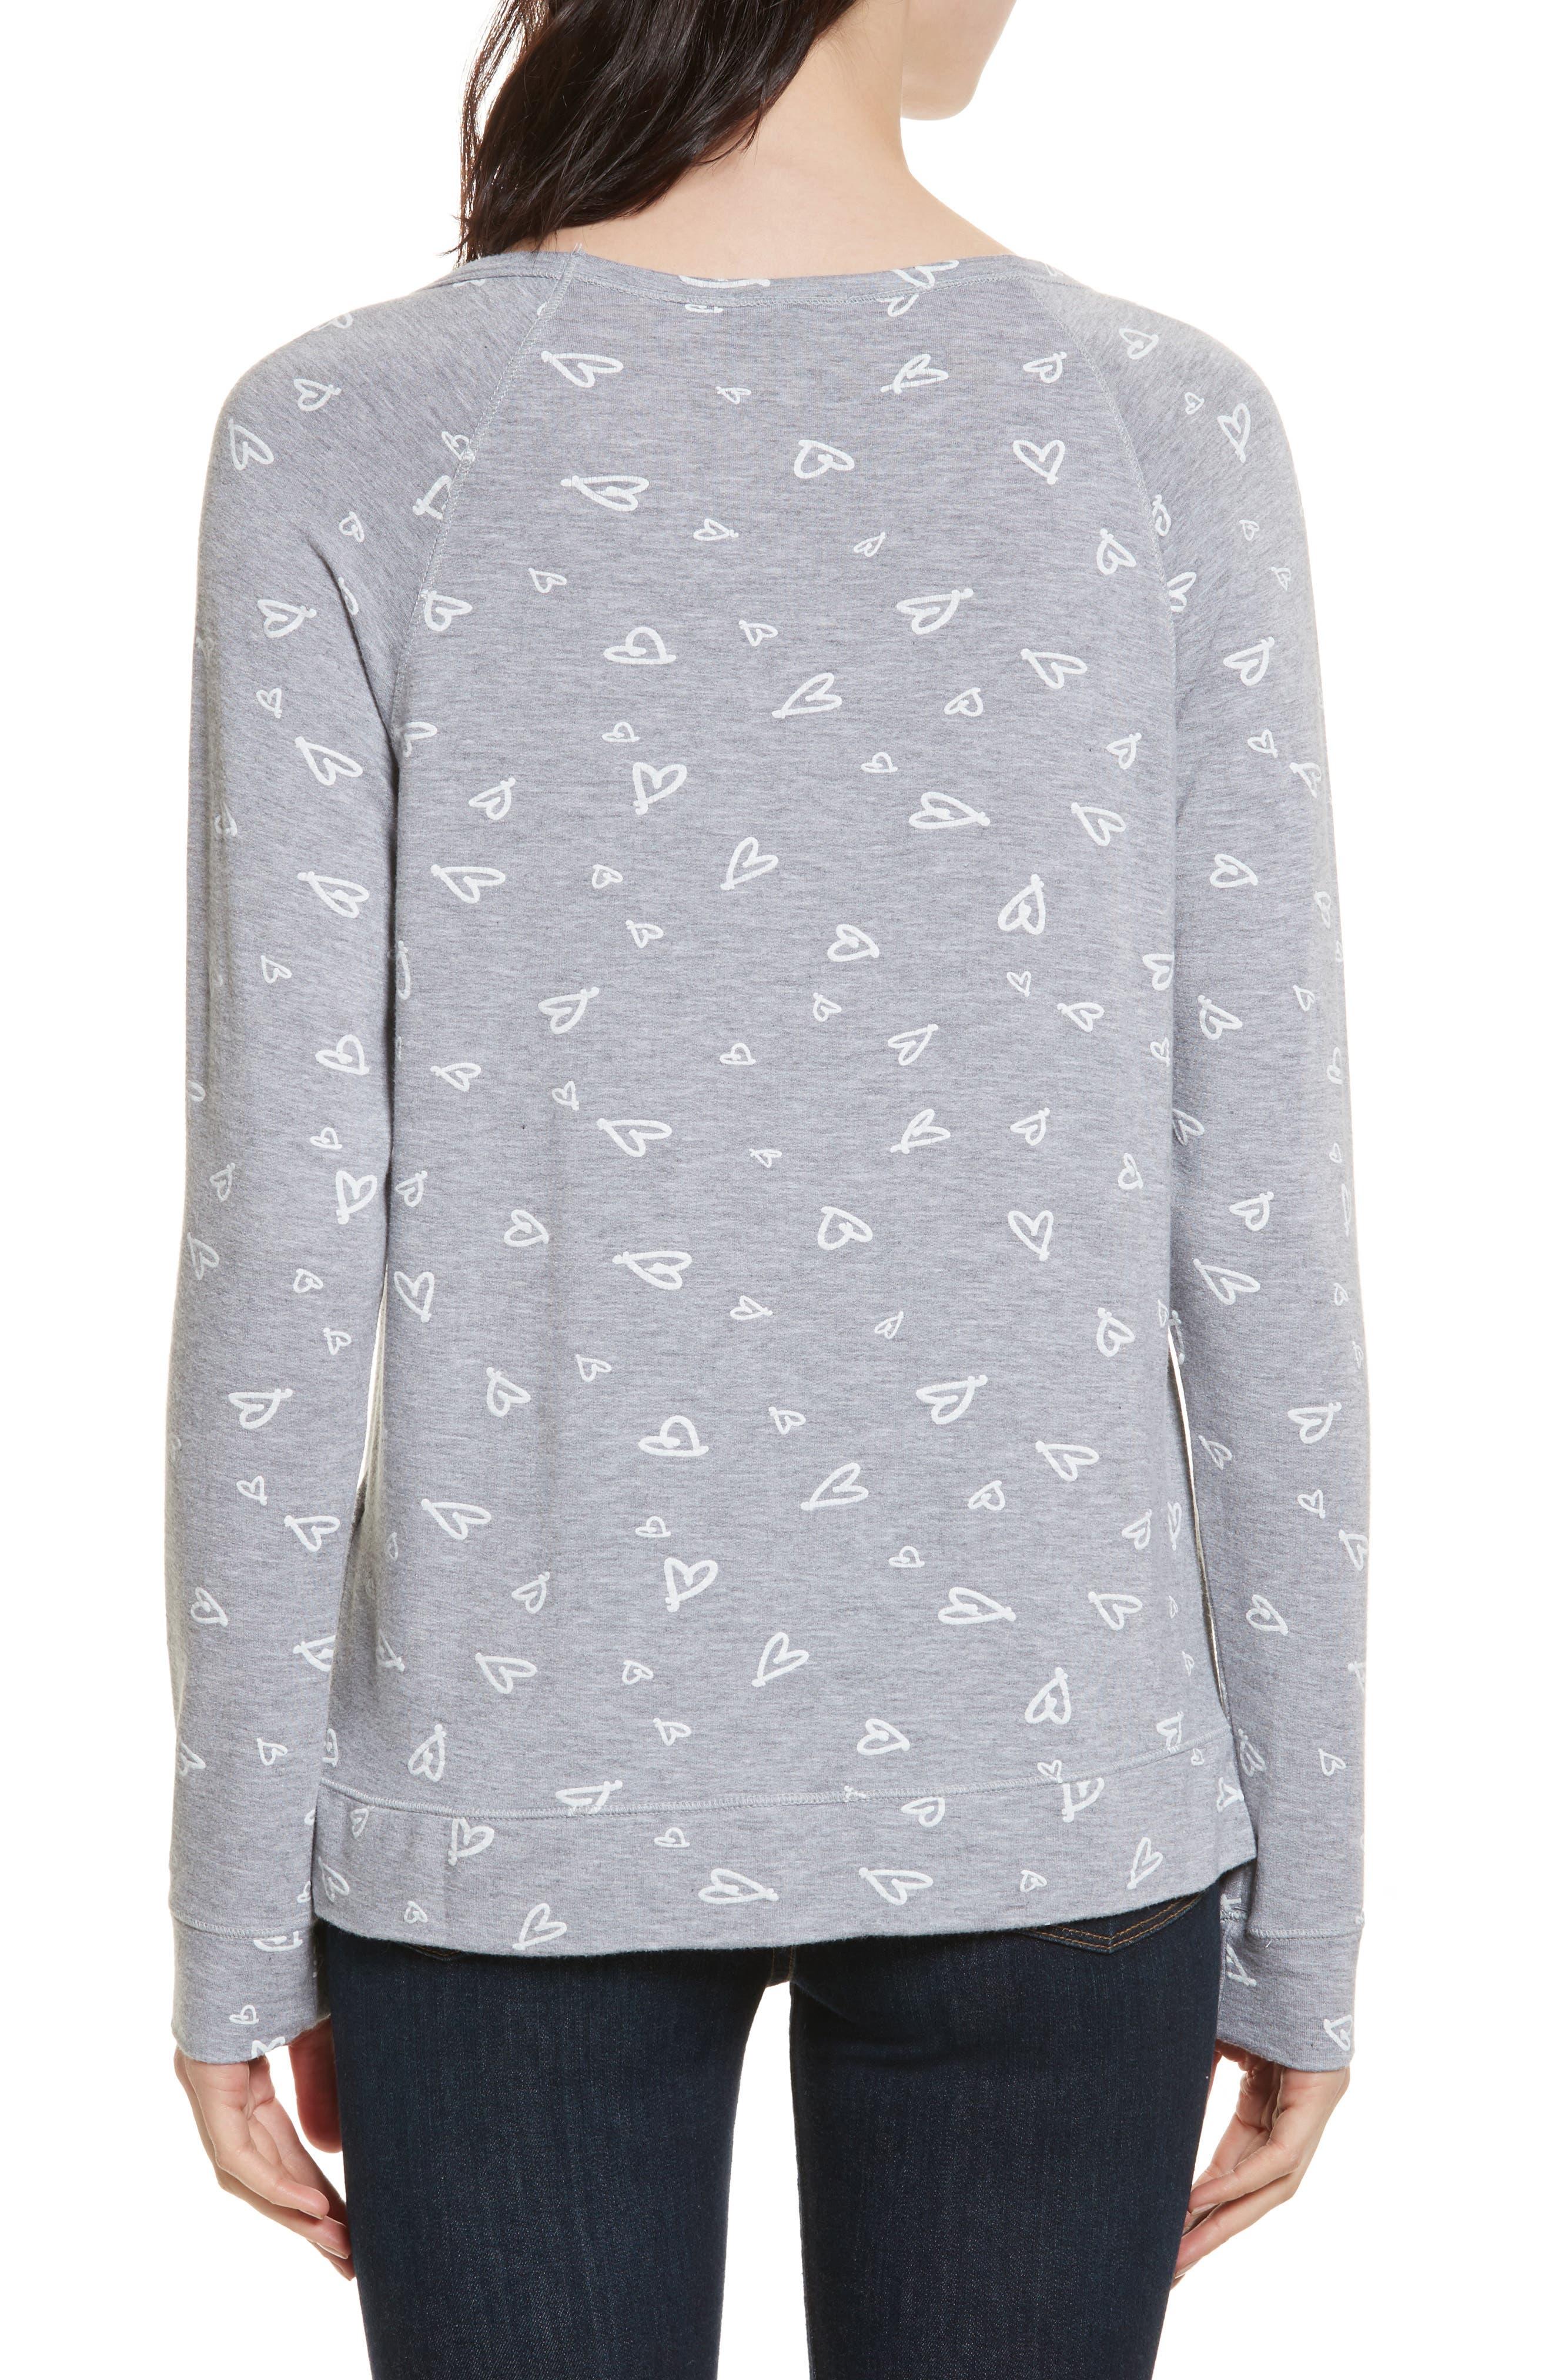 Annora B Print Cotton & Modal Blend Sweatshirt,                             Alternate thumbnail 2, color,                             071